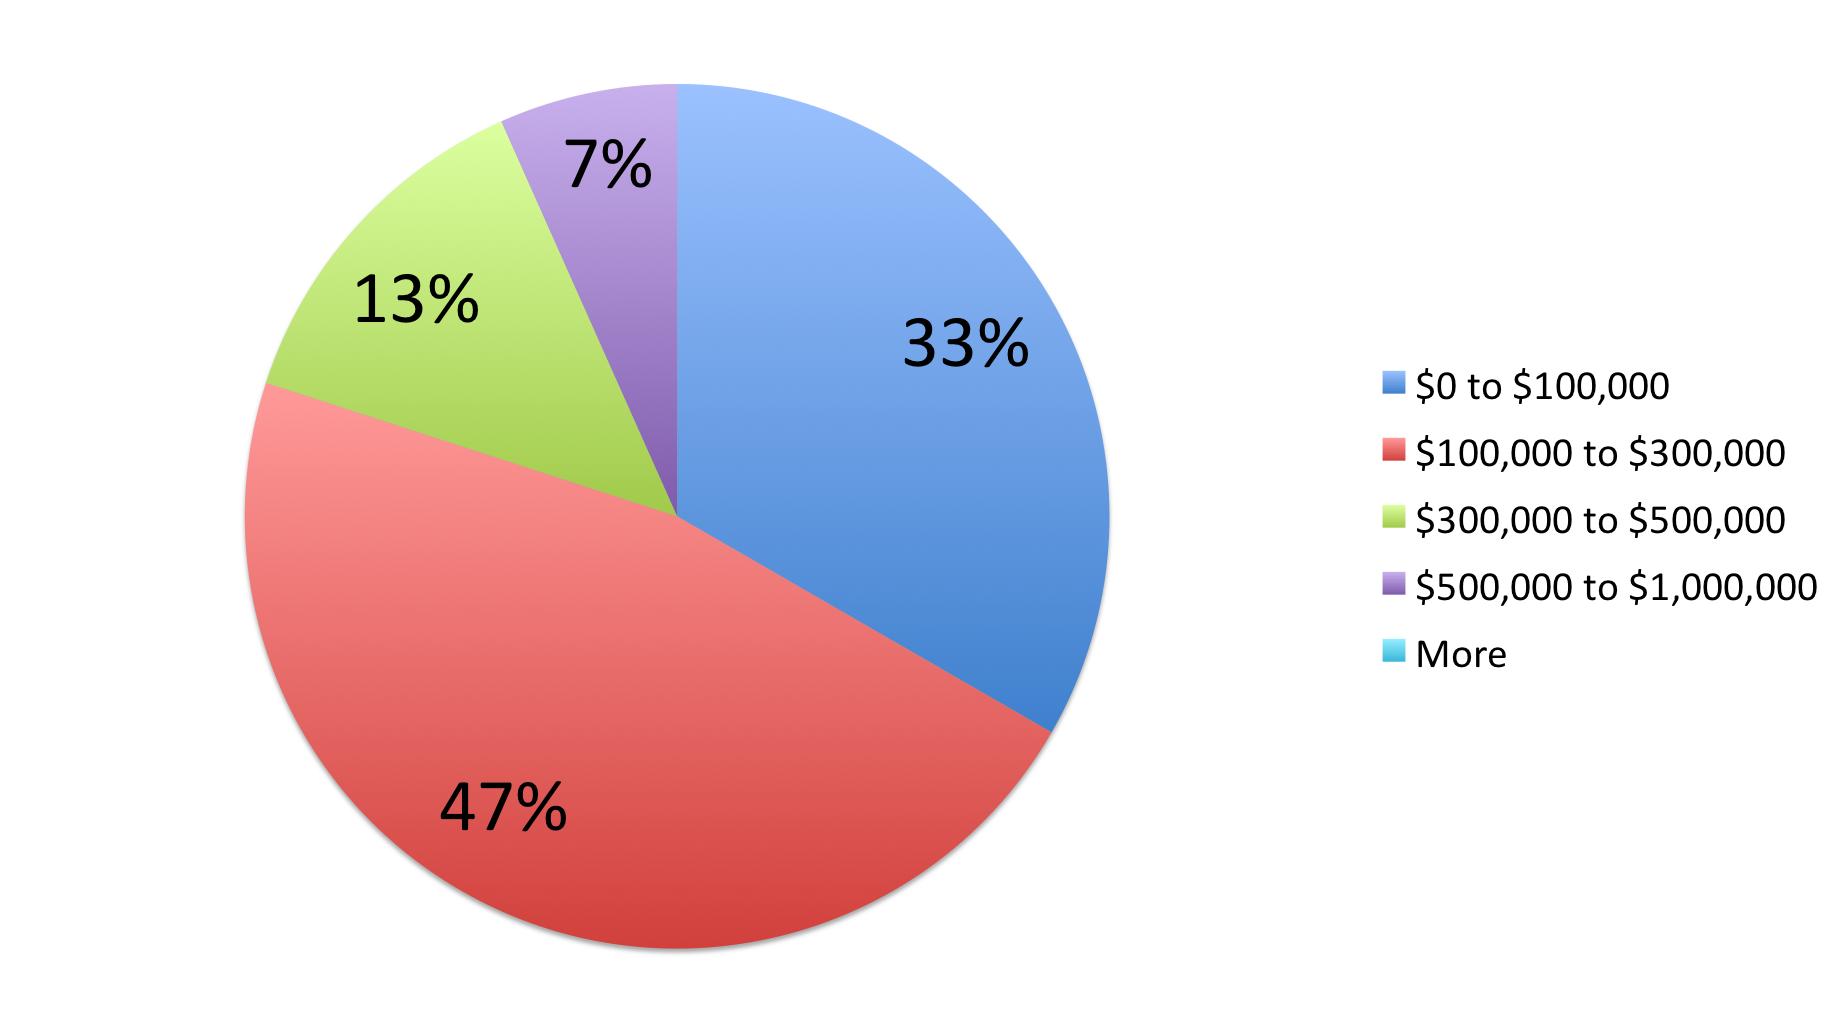 Pie chart illustrating lost sales.